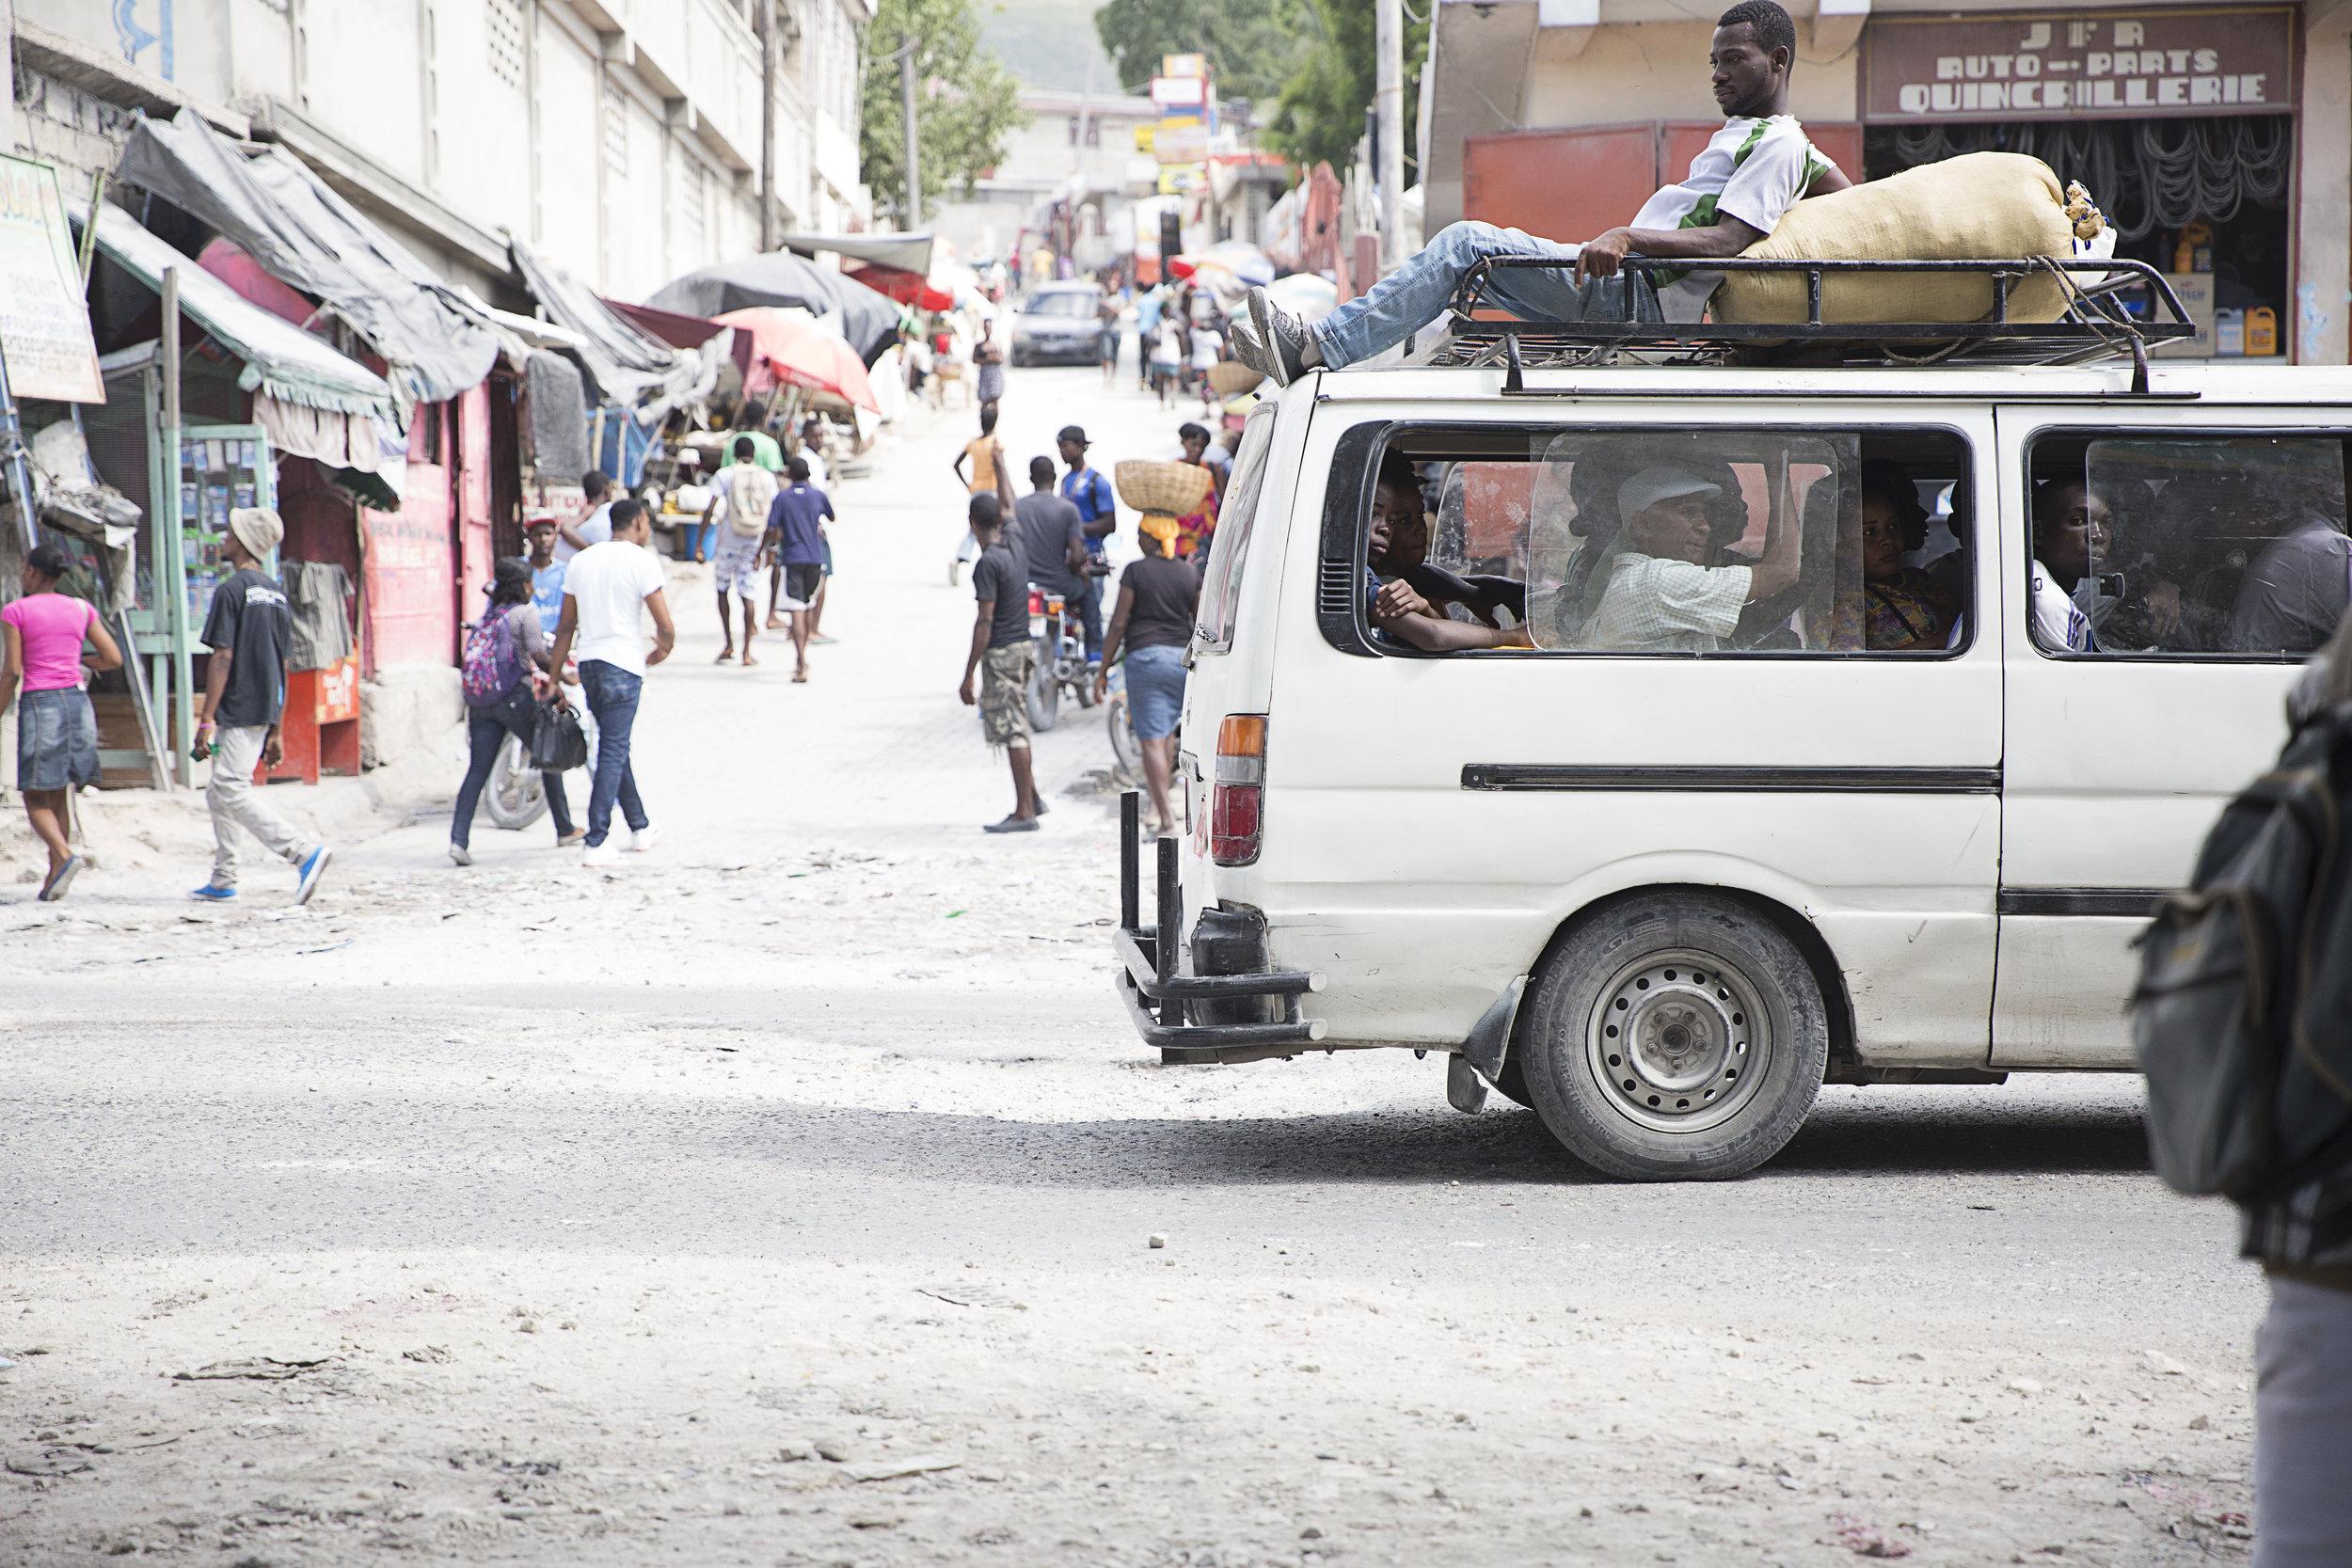 We love this peek into the hustle of Haiti, captured by our dear friend Mackenzie Fugett (Mackenzie Lee Photography).